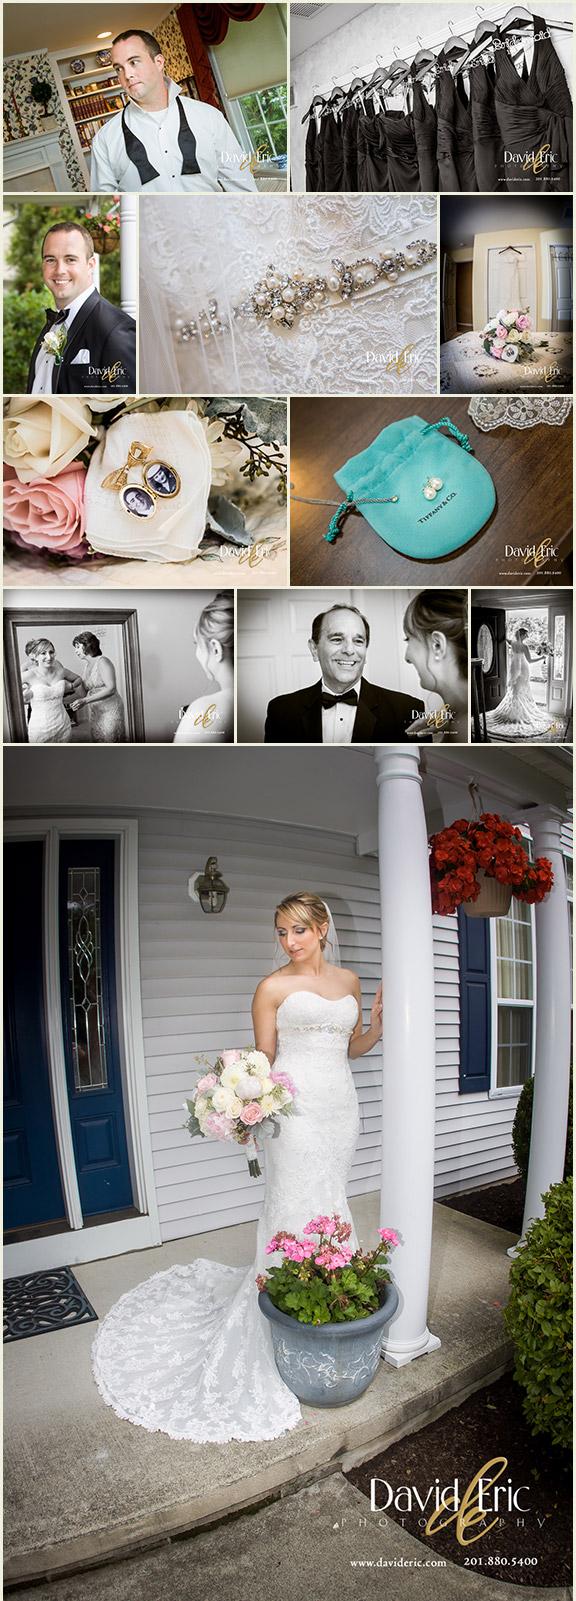 Pleasantdale Chateau Wedding West Orange New Jersey_138